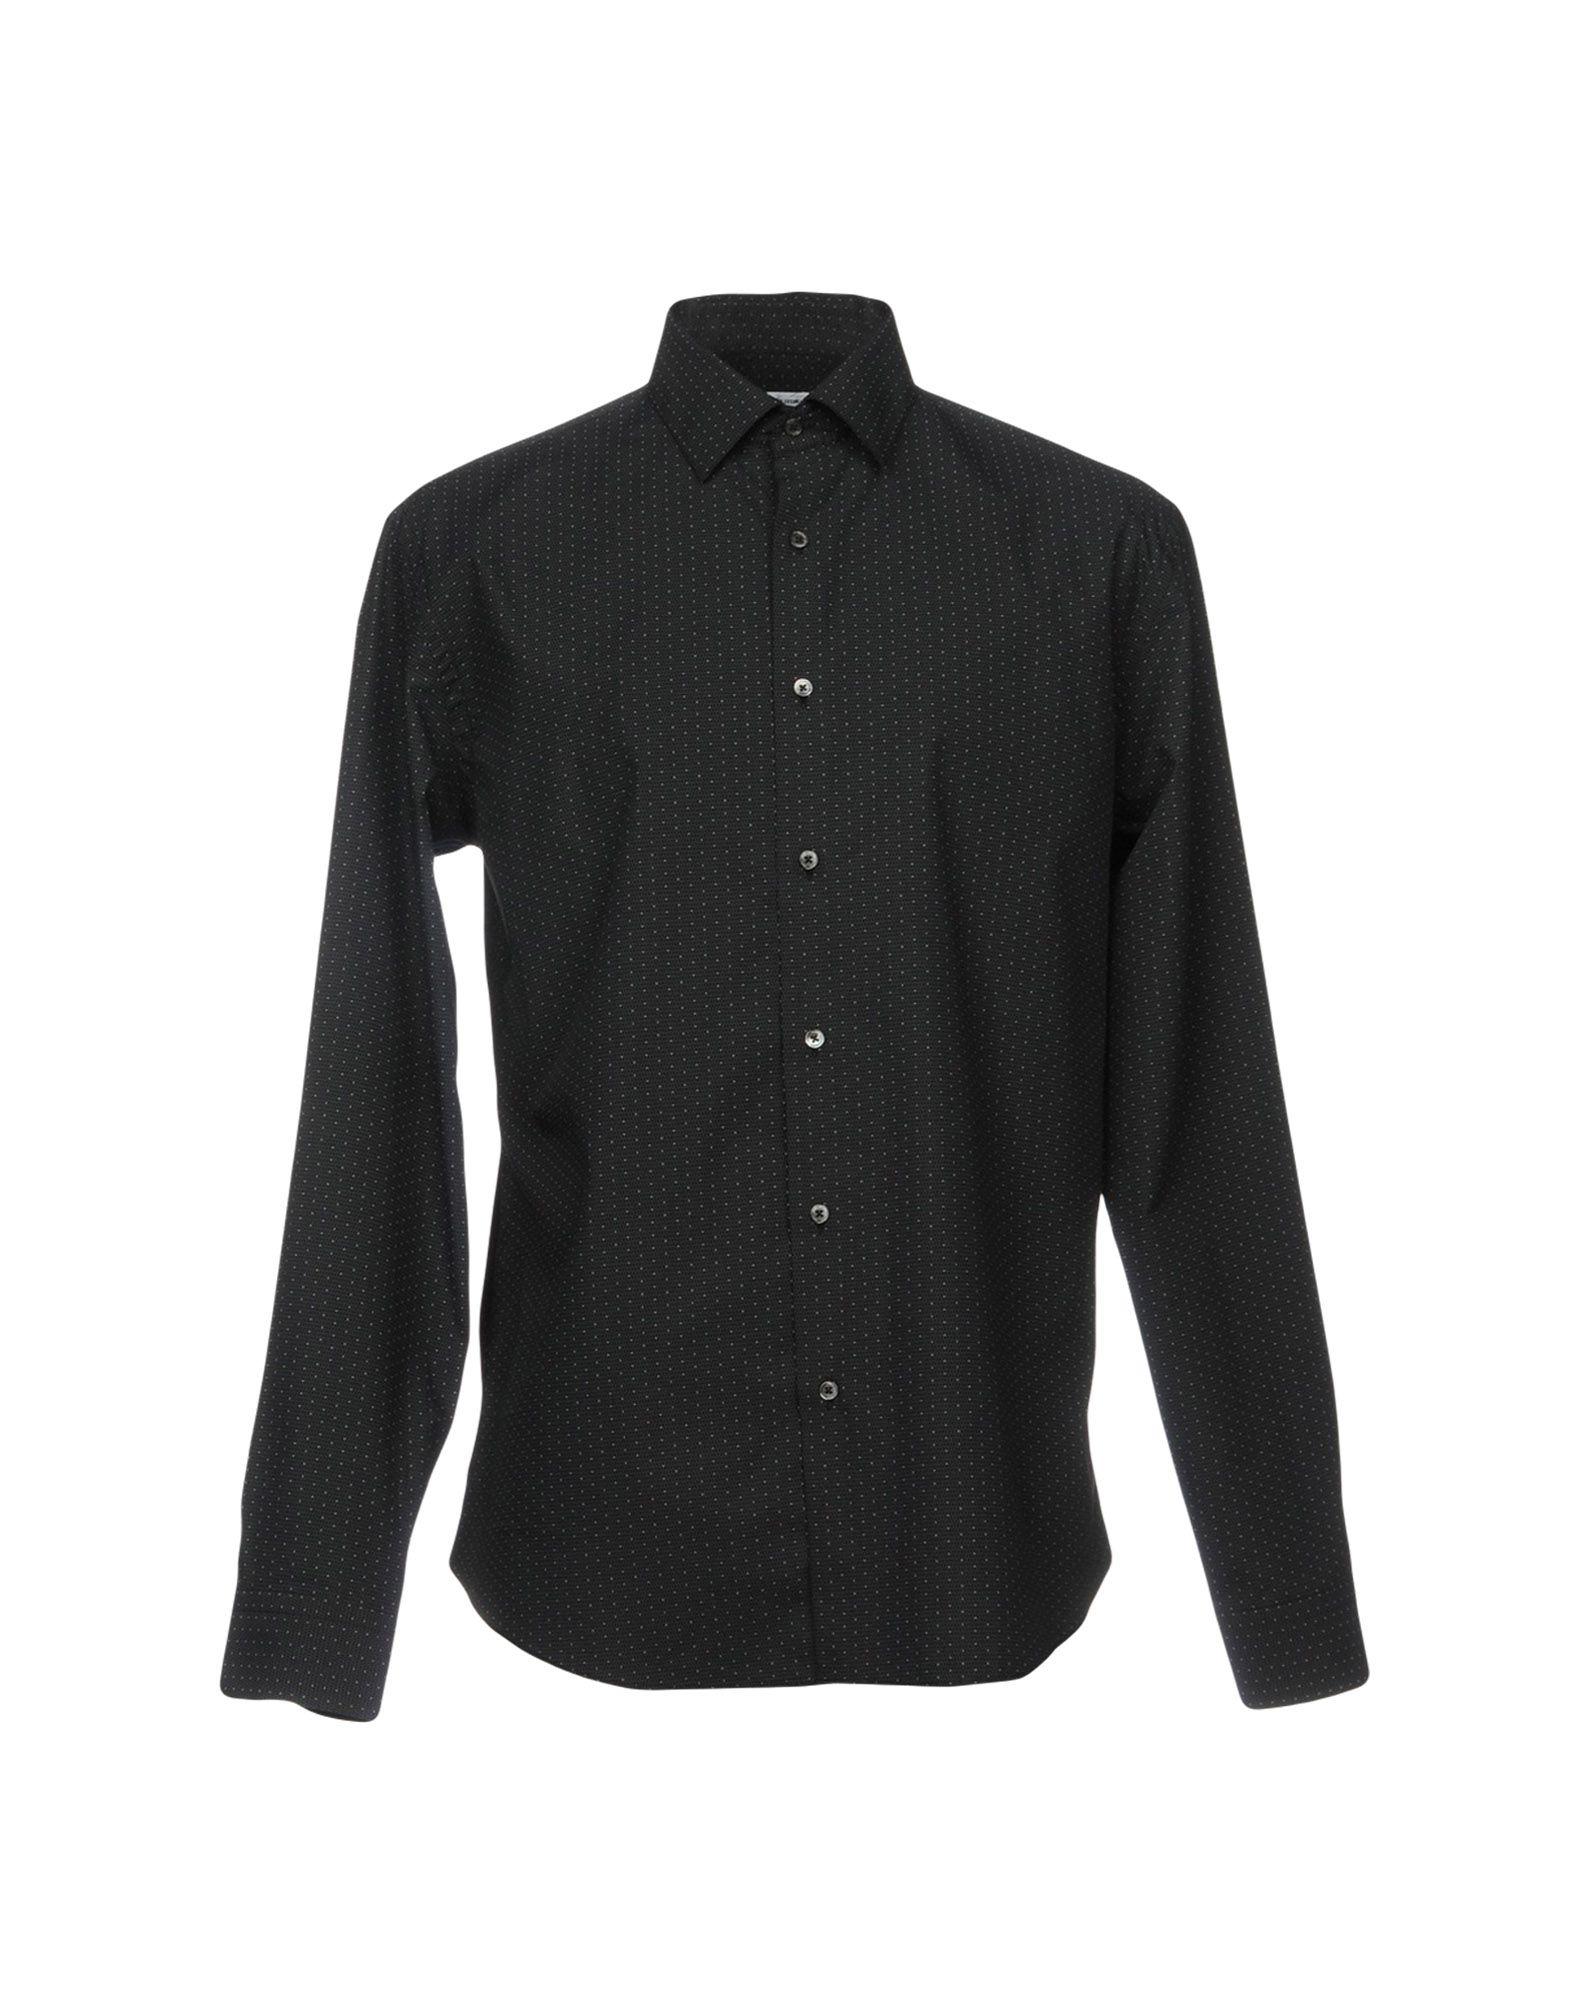 ROBERT FRIEDMAN Patterned Shirt in Black